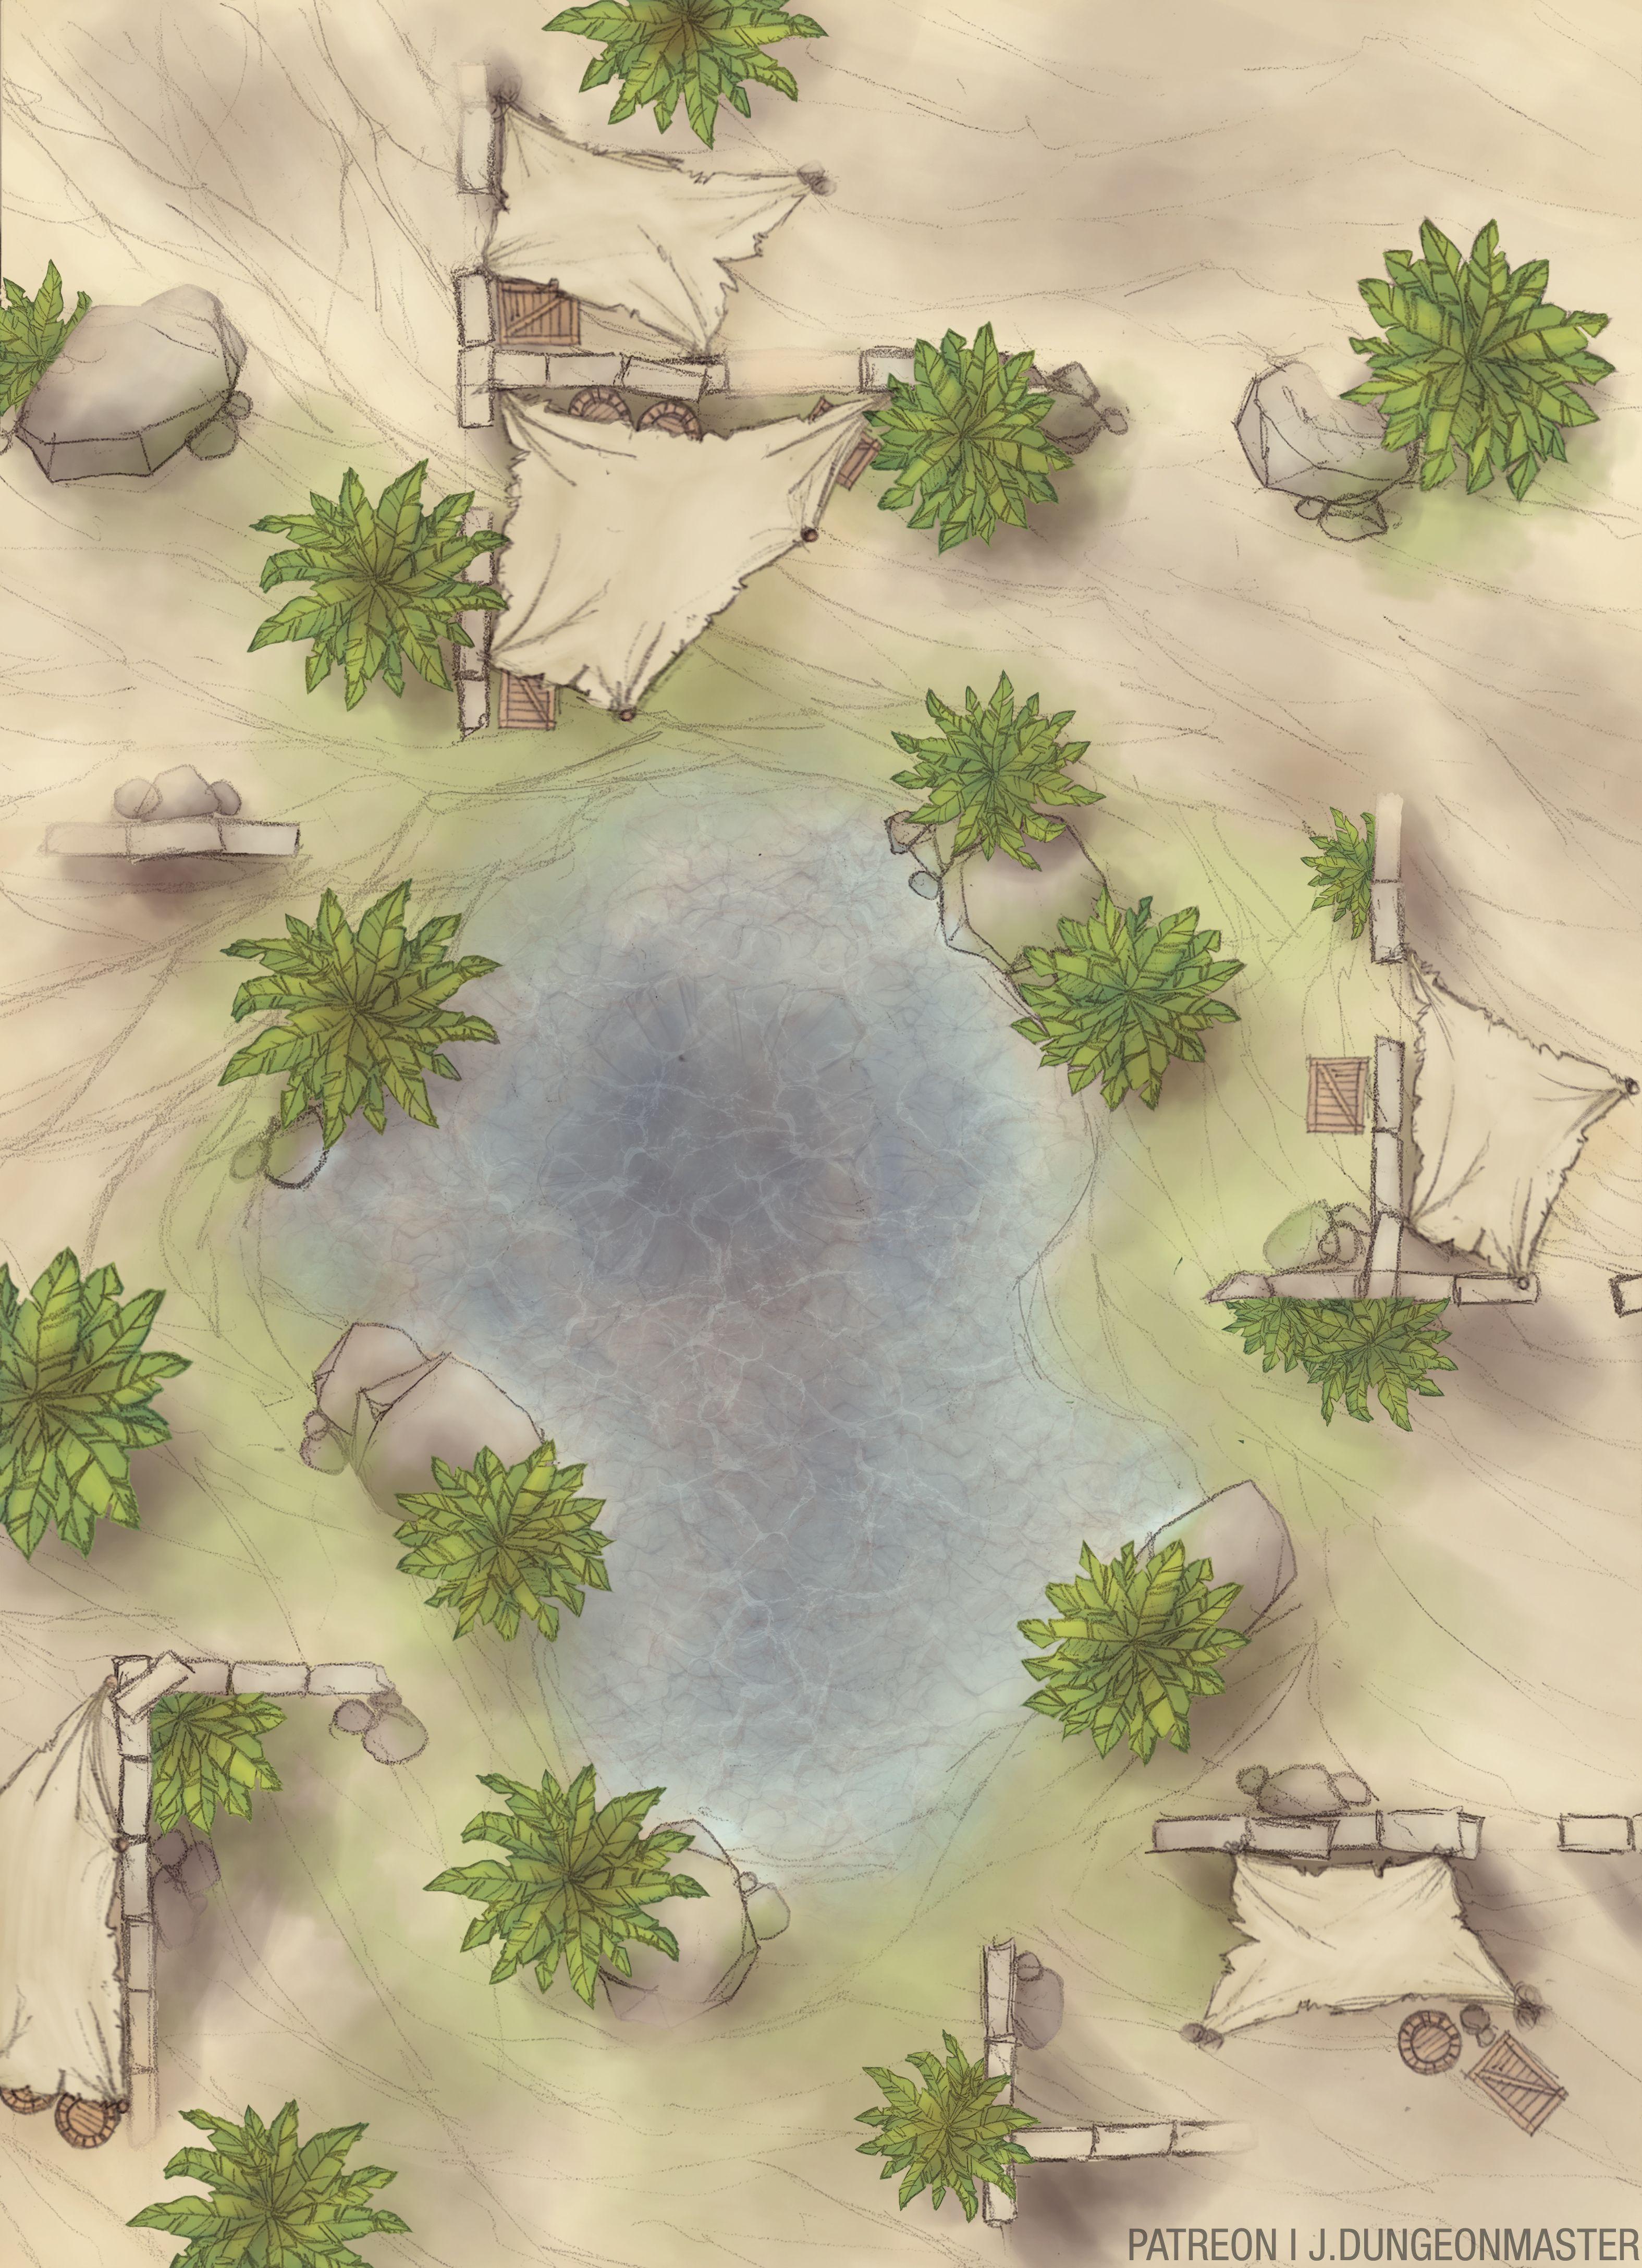 Desert Oasis In Halloween 2020 The Desert Oasis | J.Dungeonmaster on Patreon in 2020 | Desert map